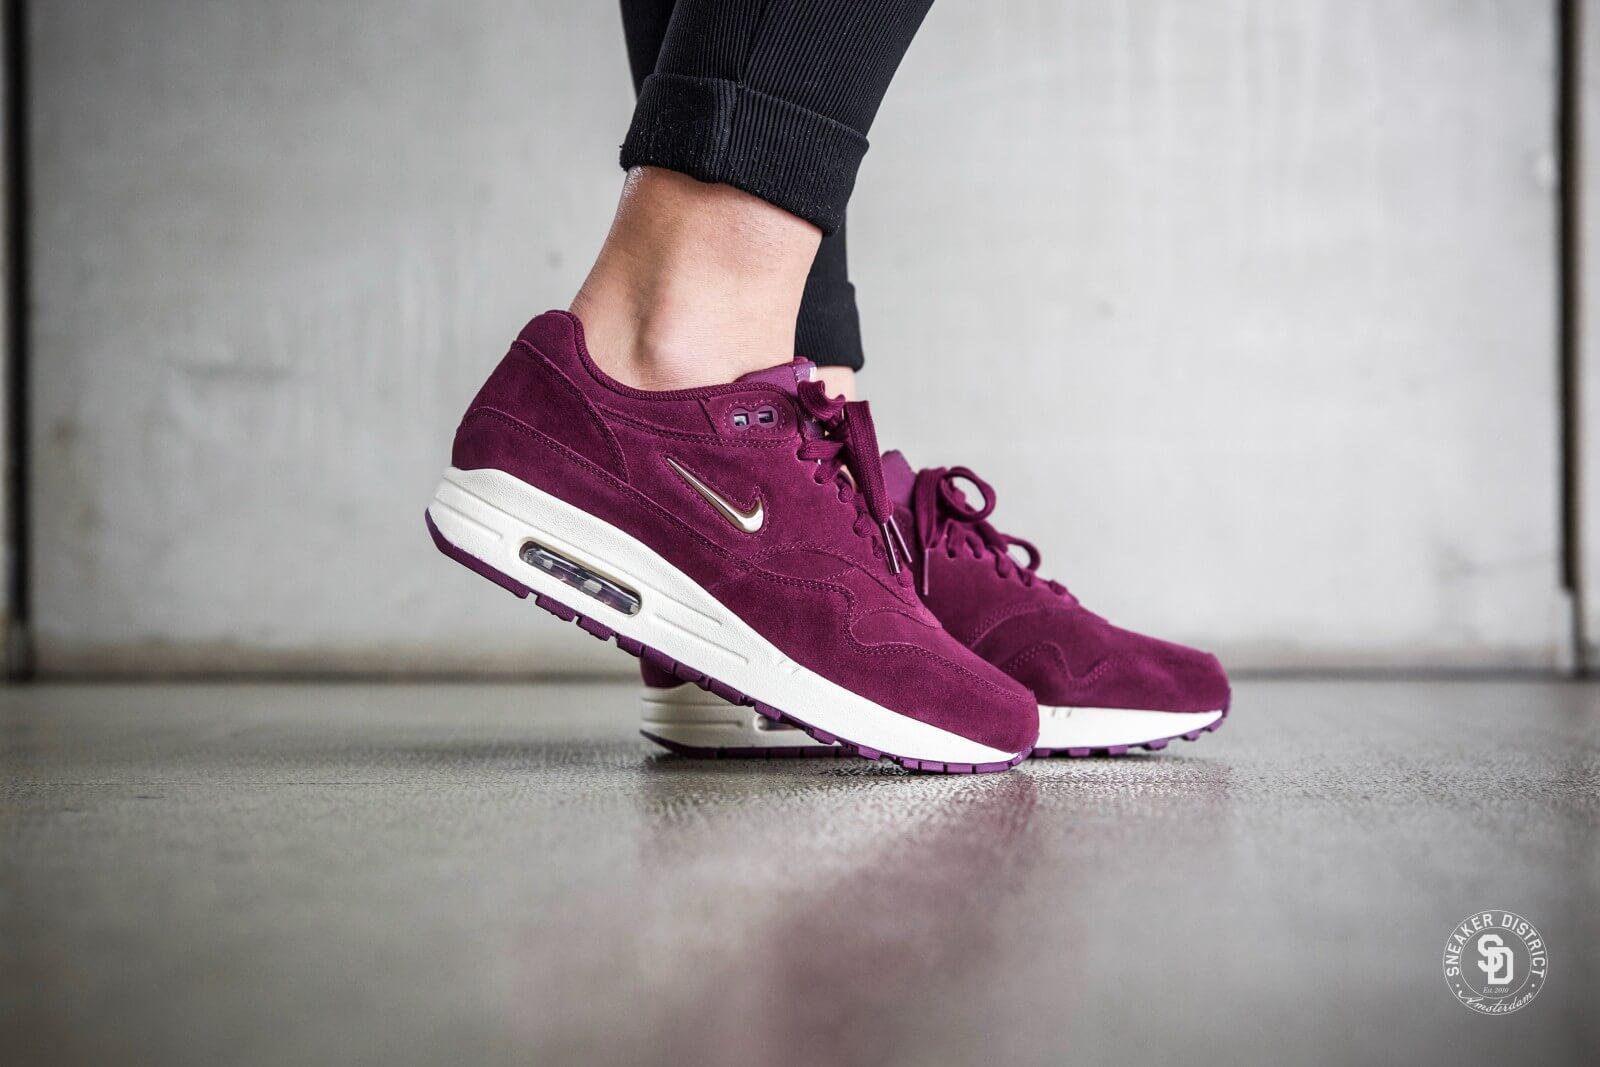 Nike Women's Air Max 1 Premium SC Jewel Bordeaux/Blur-Bio Beige